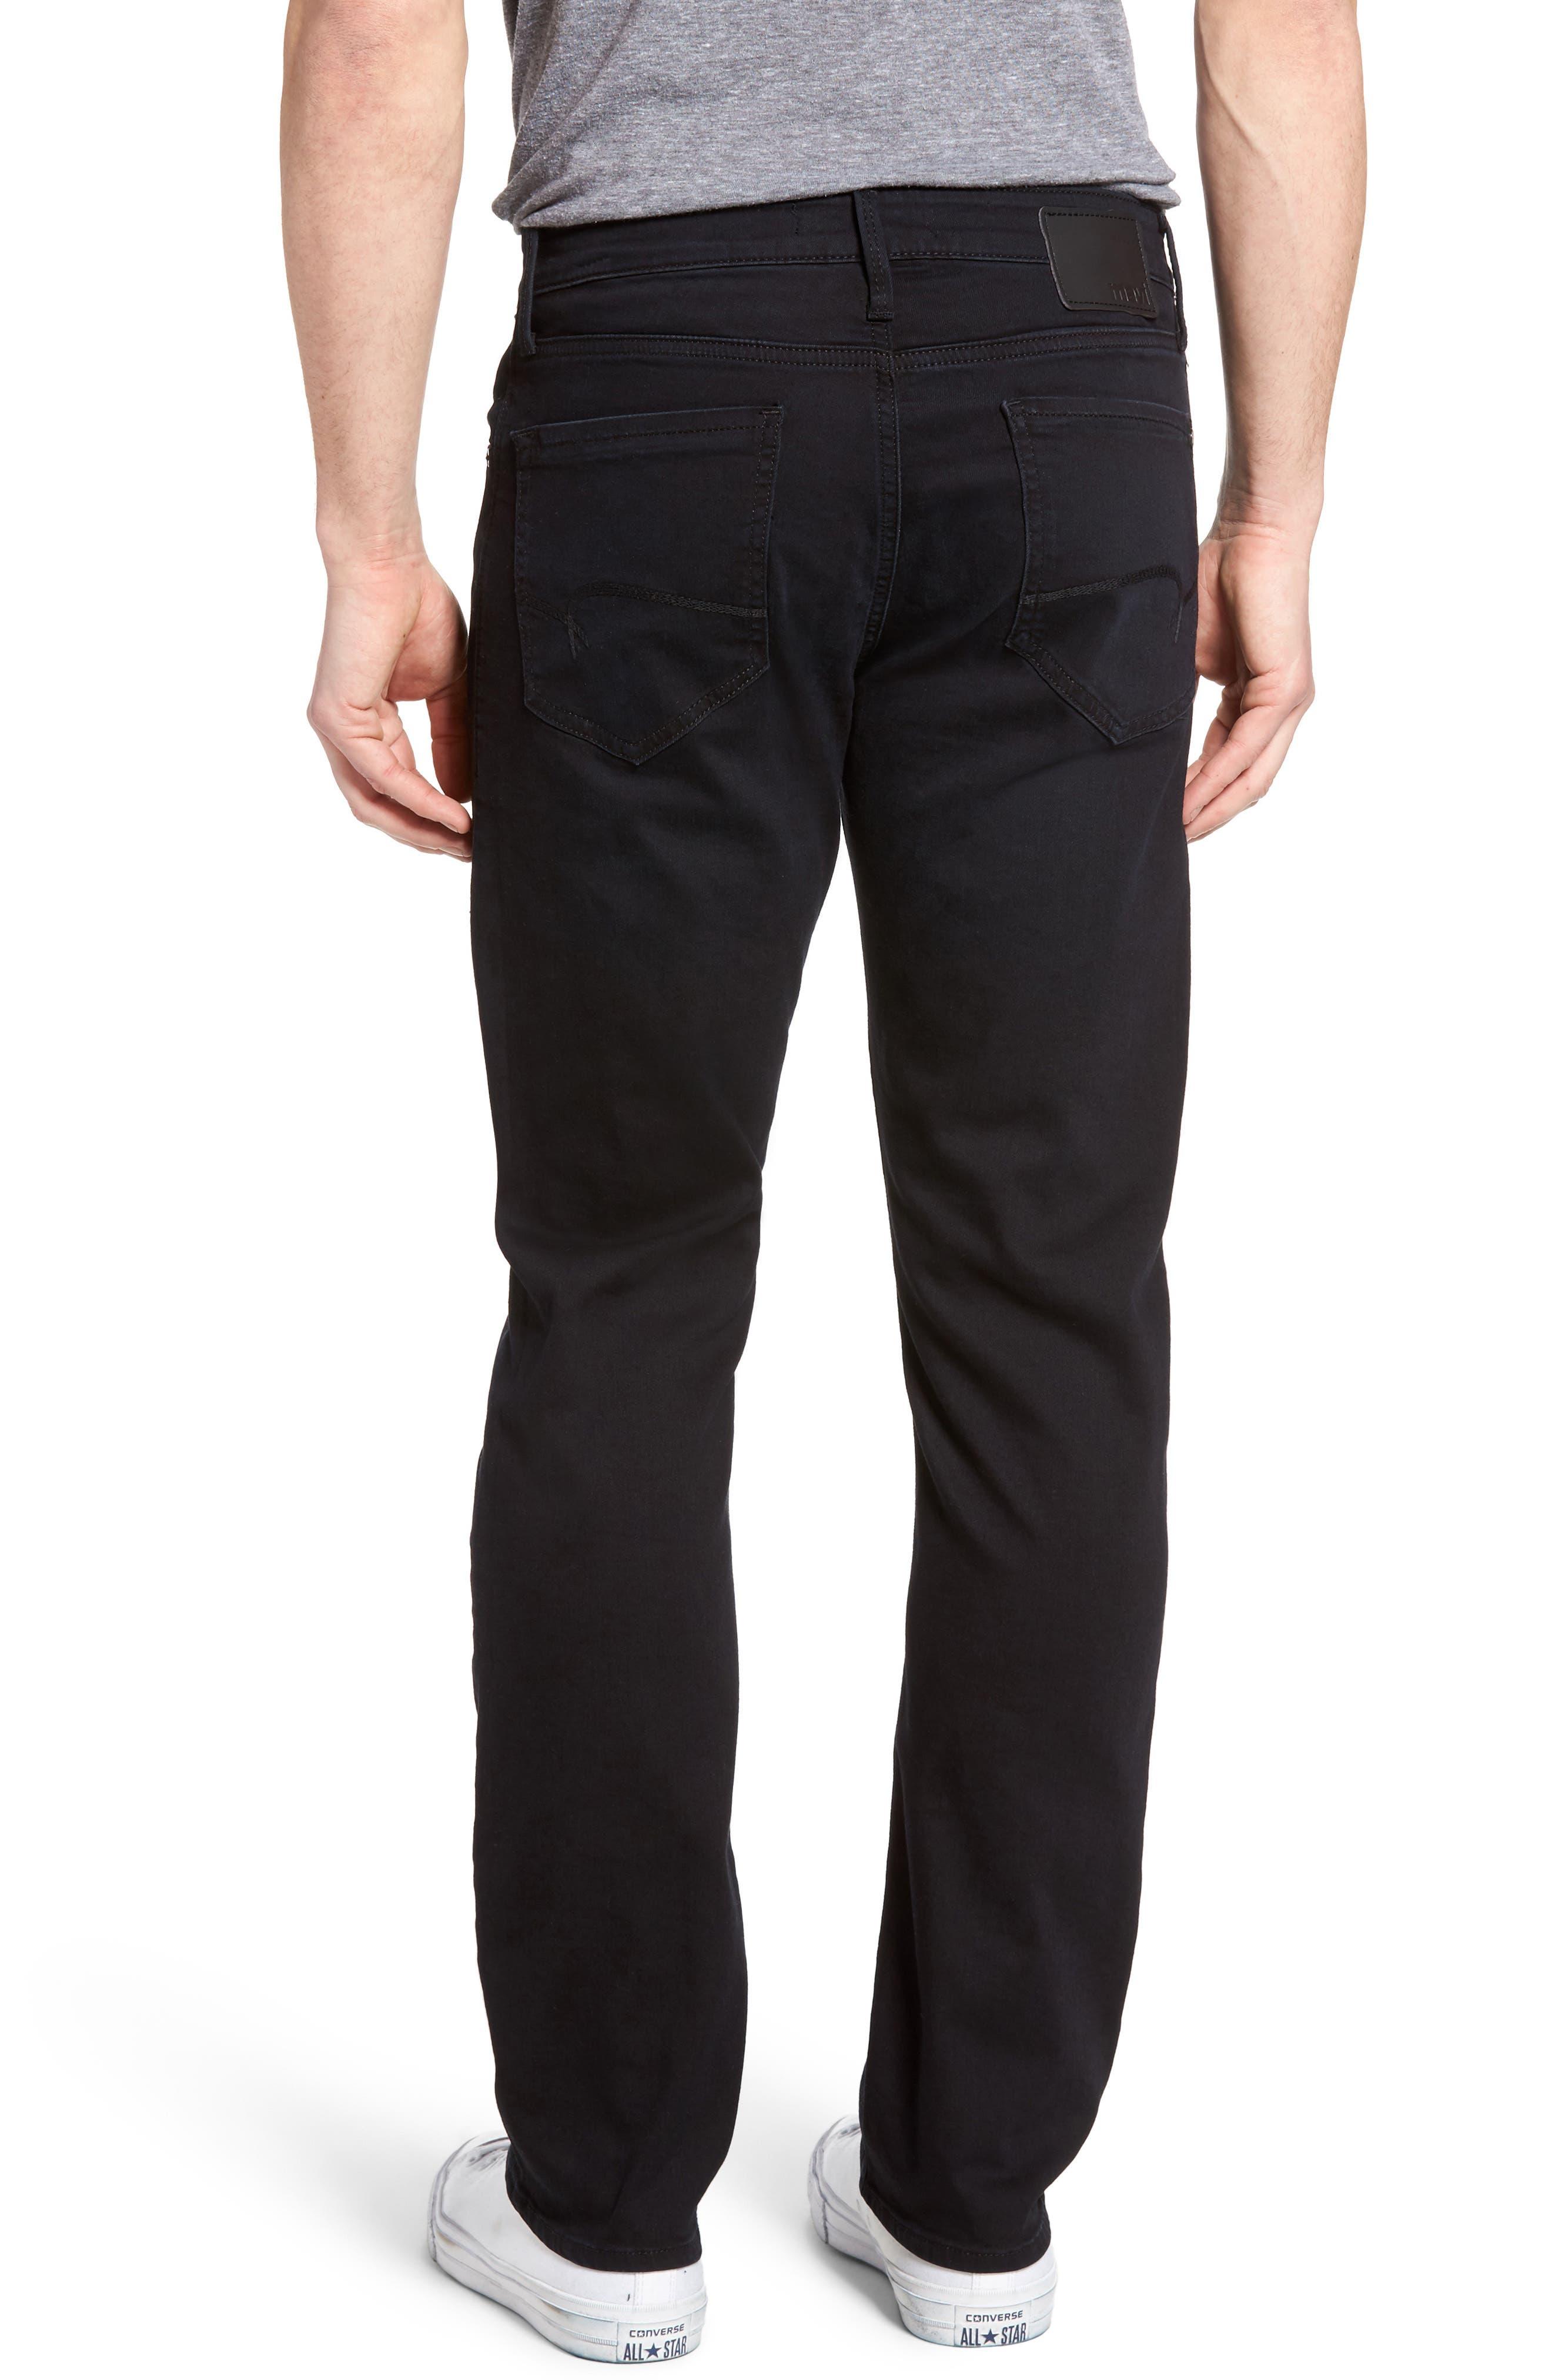 Zach Straight Leg Jeans,                             Alternate thumbnail 2, color,                             401